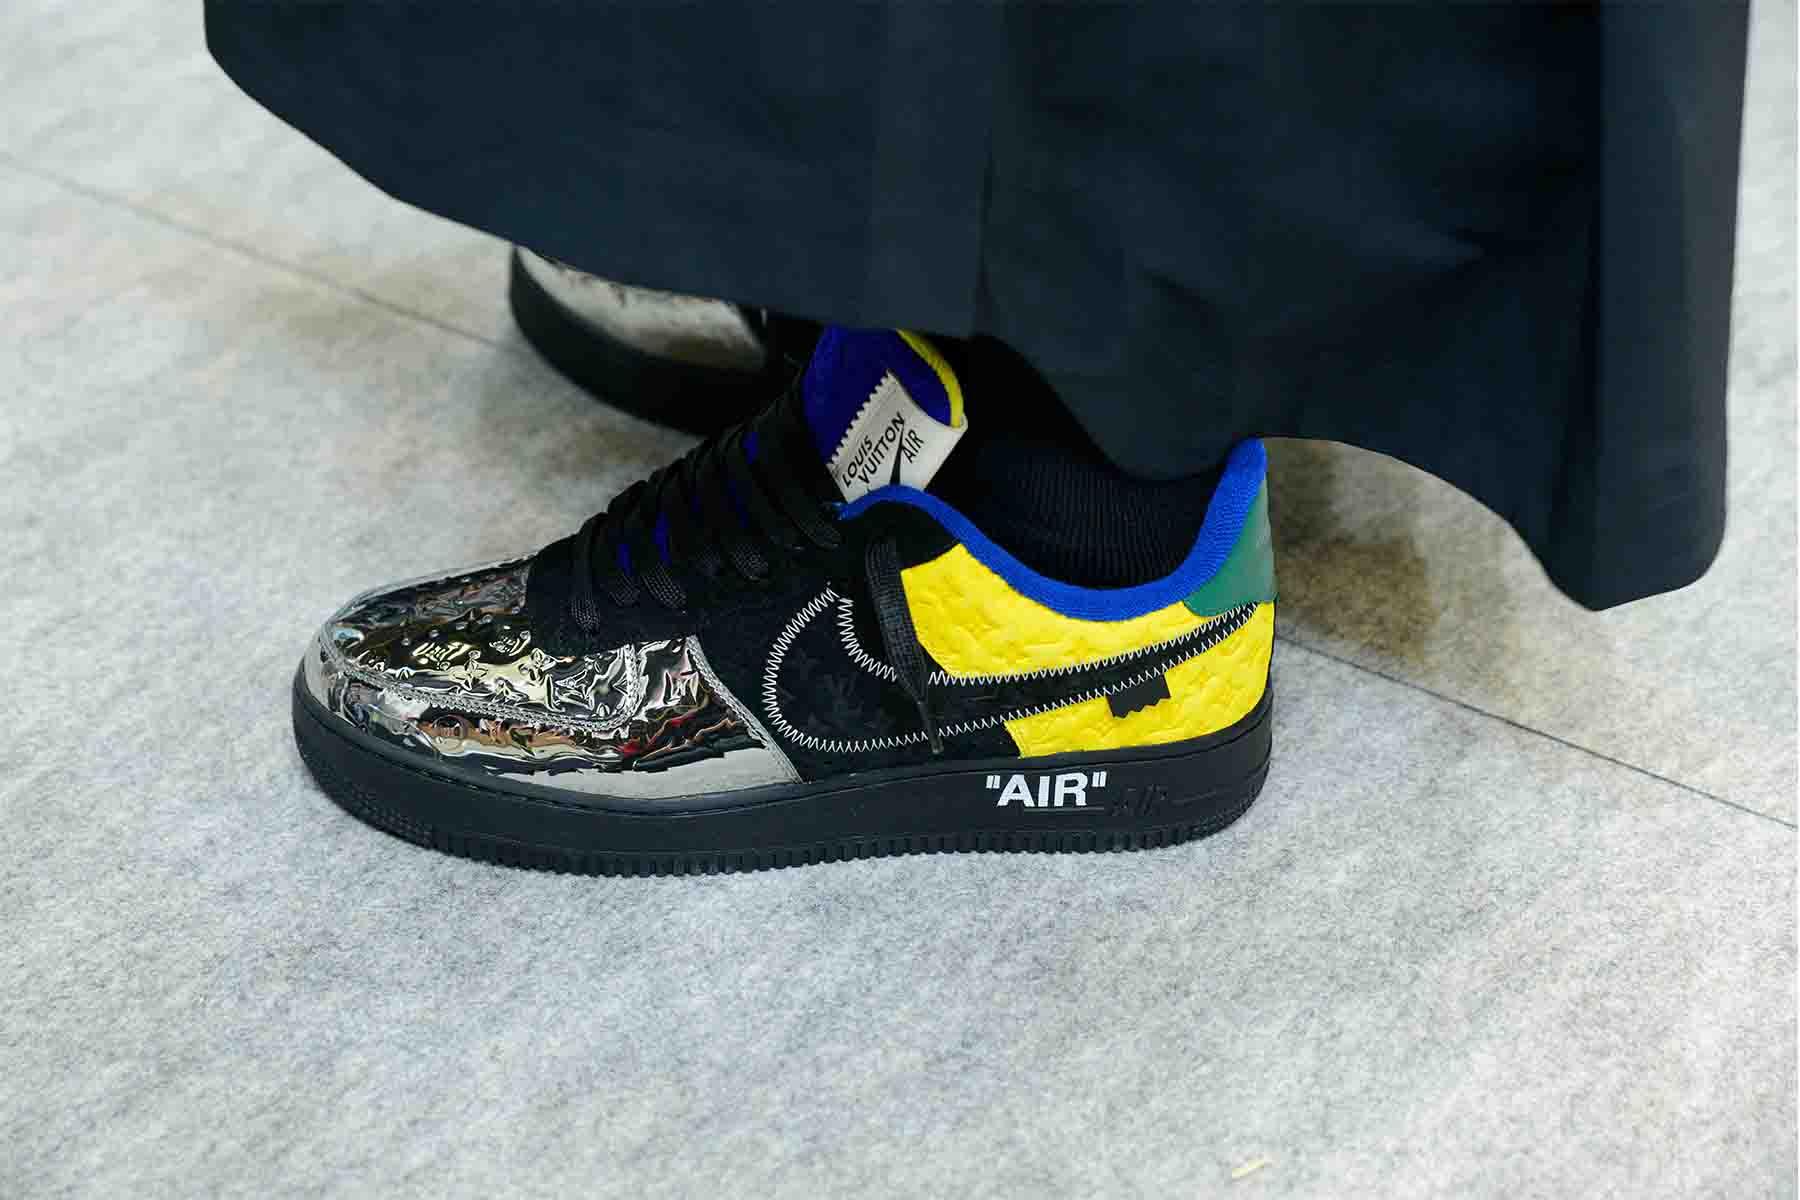 Die besten Sneaker Collaborations 2021: Nike X Louis Vuitton